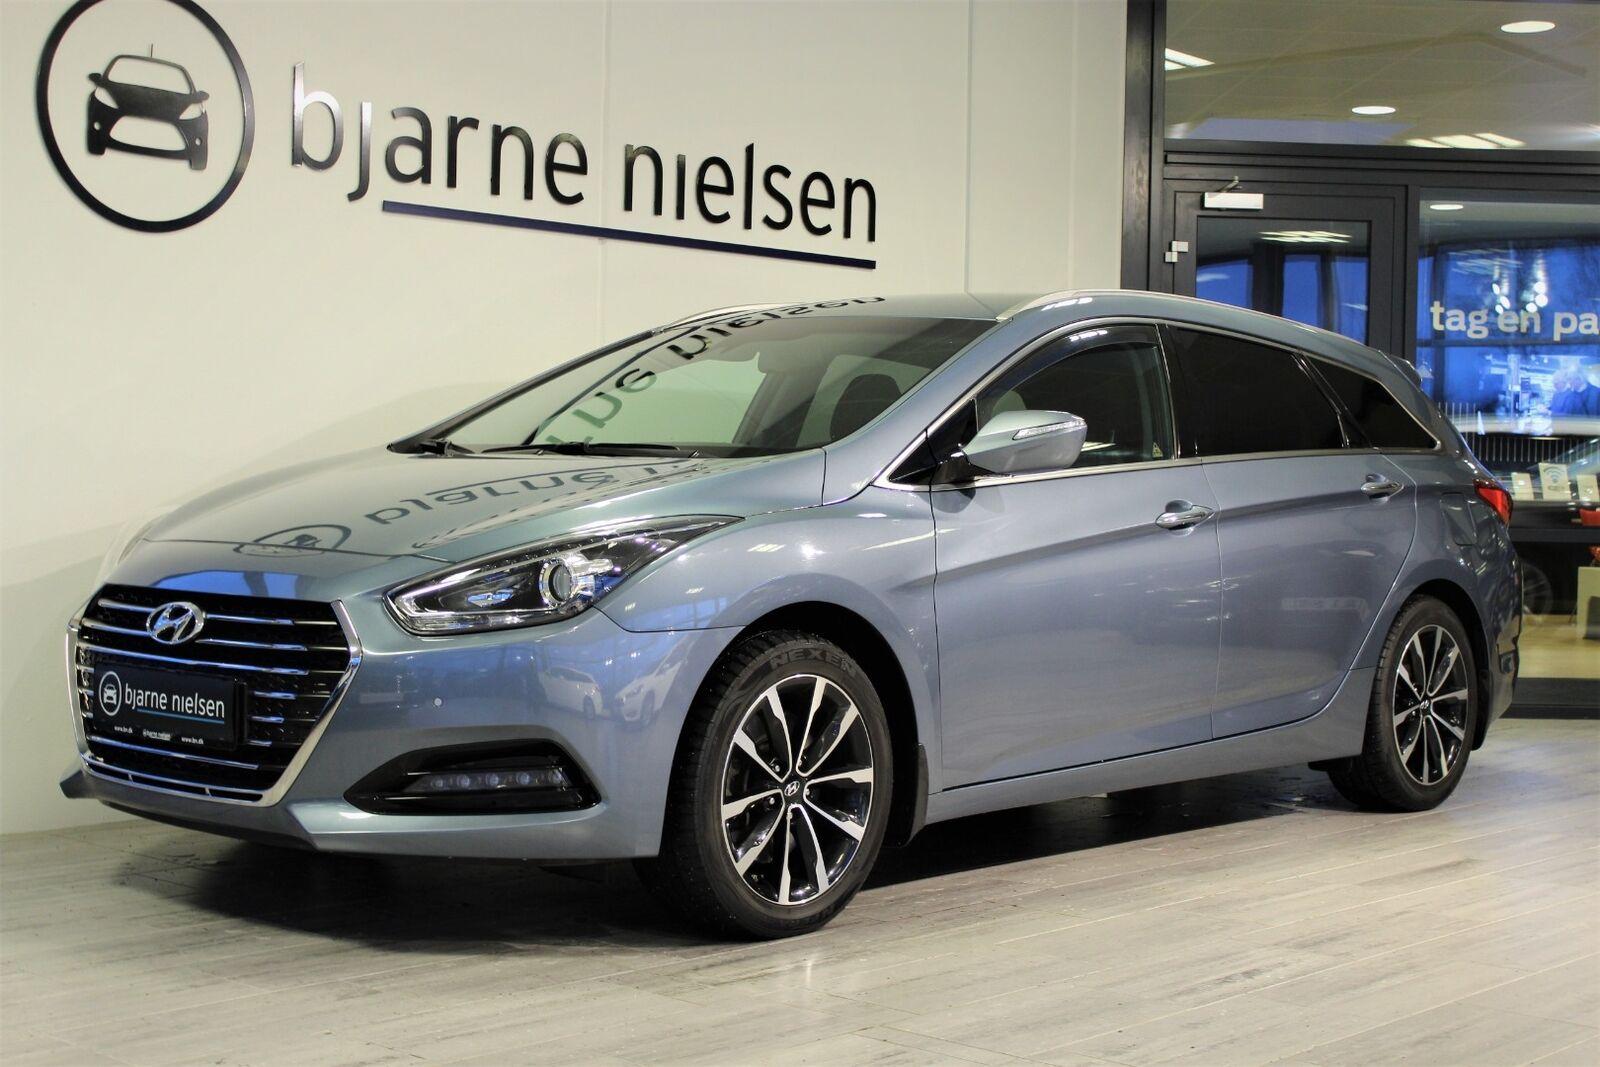 Hyundai i40 Billede 6